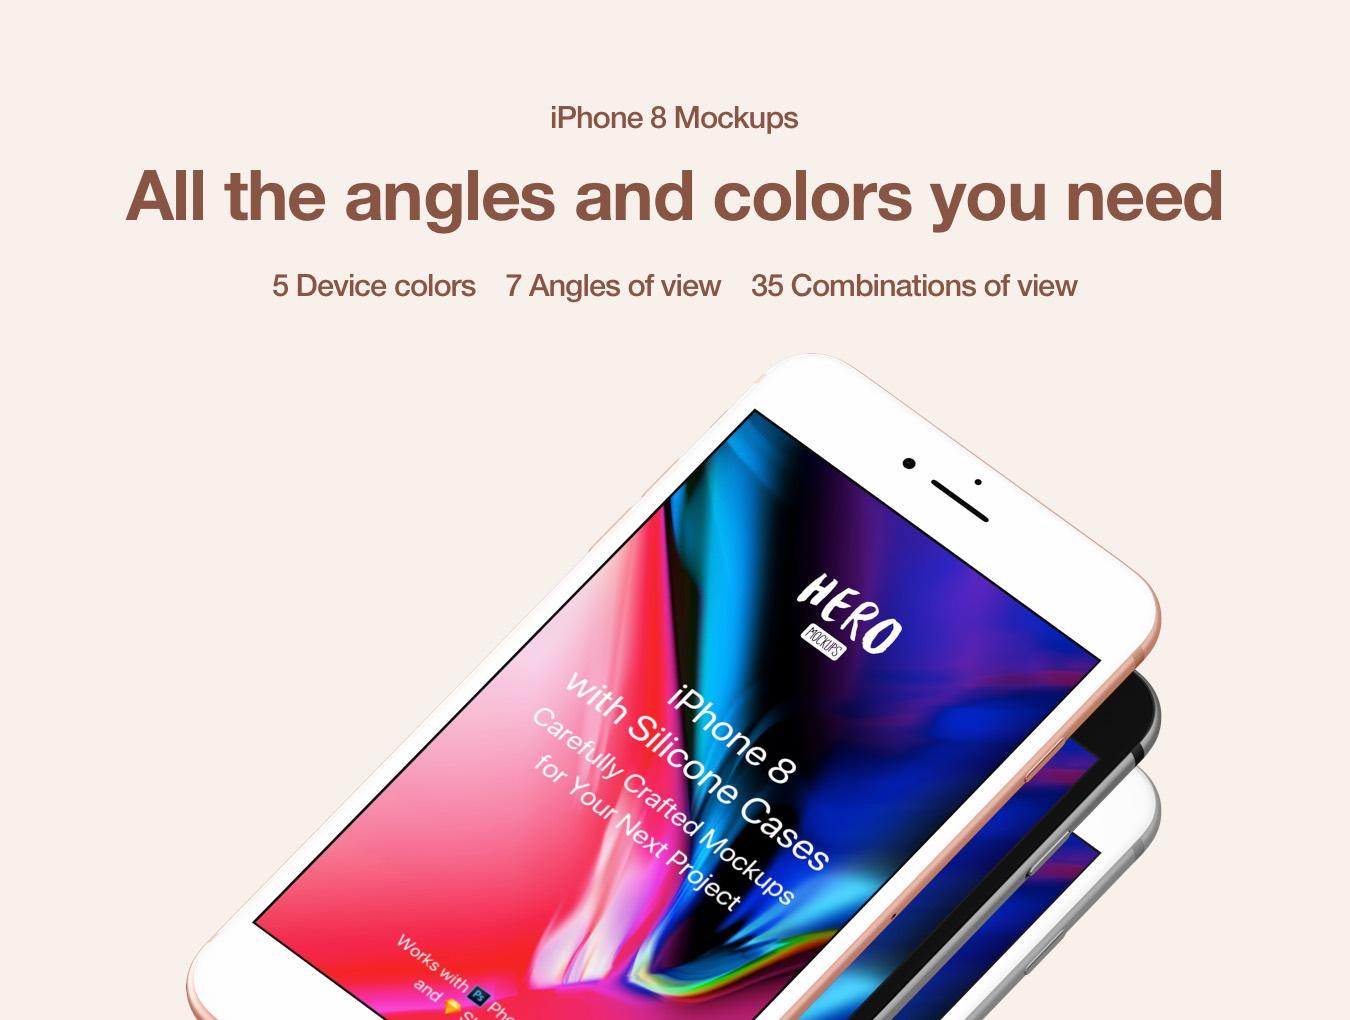 Download Iphone X Mockup Free Sketch PSD - Free PSD Mockup Templates